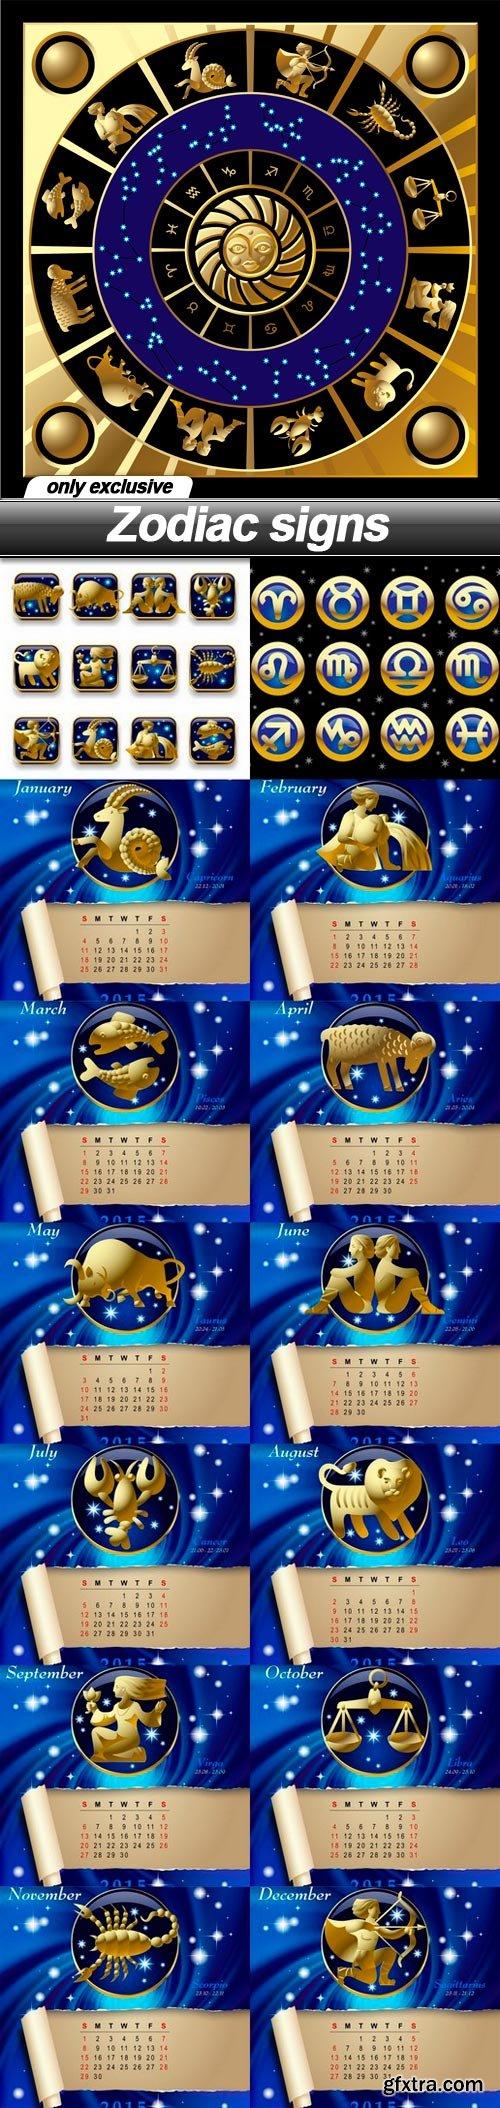 Zodiac signs - 15 EPS